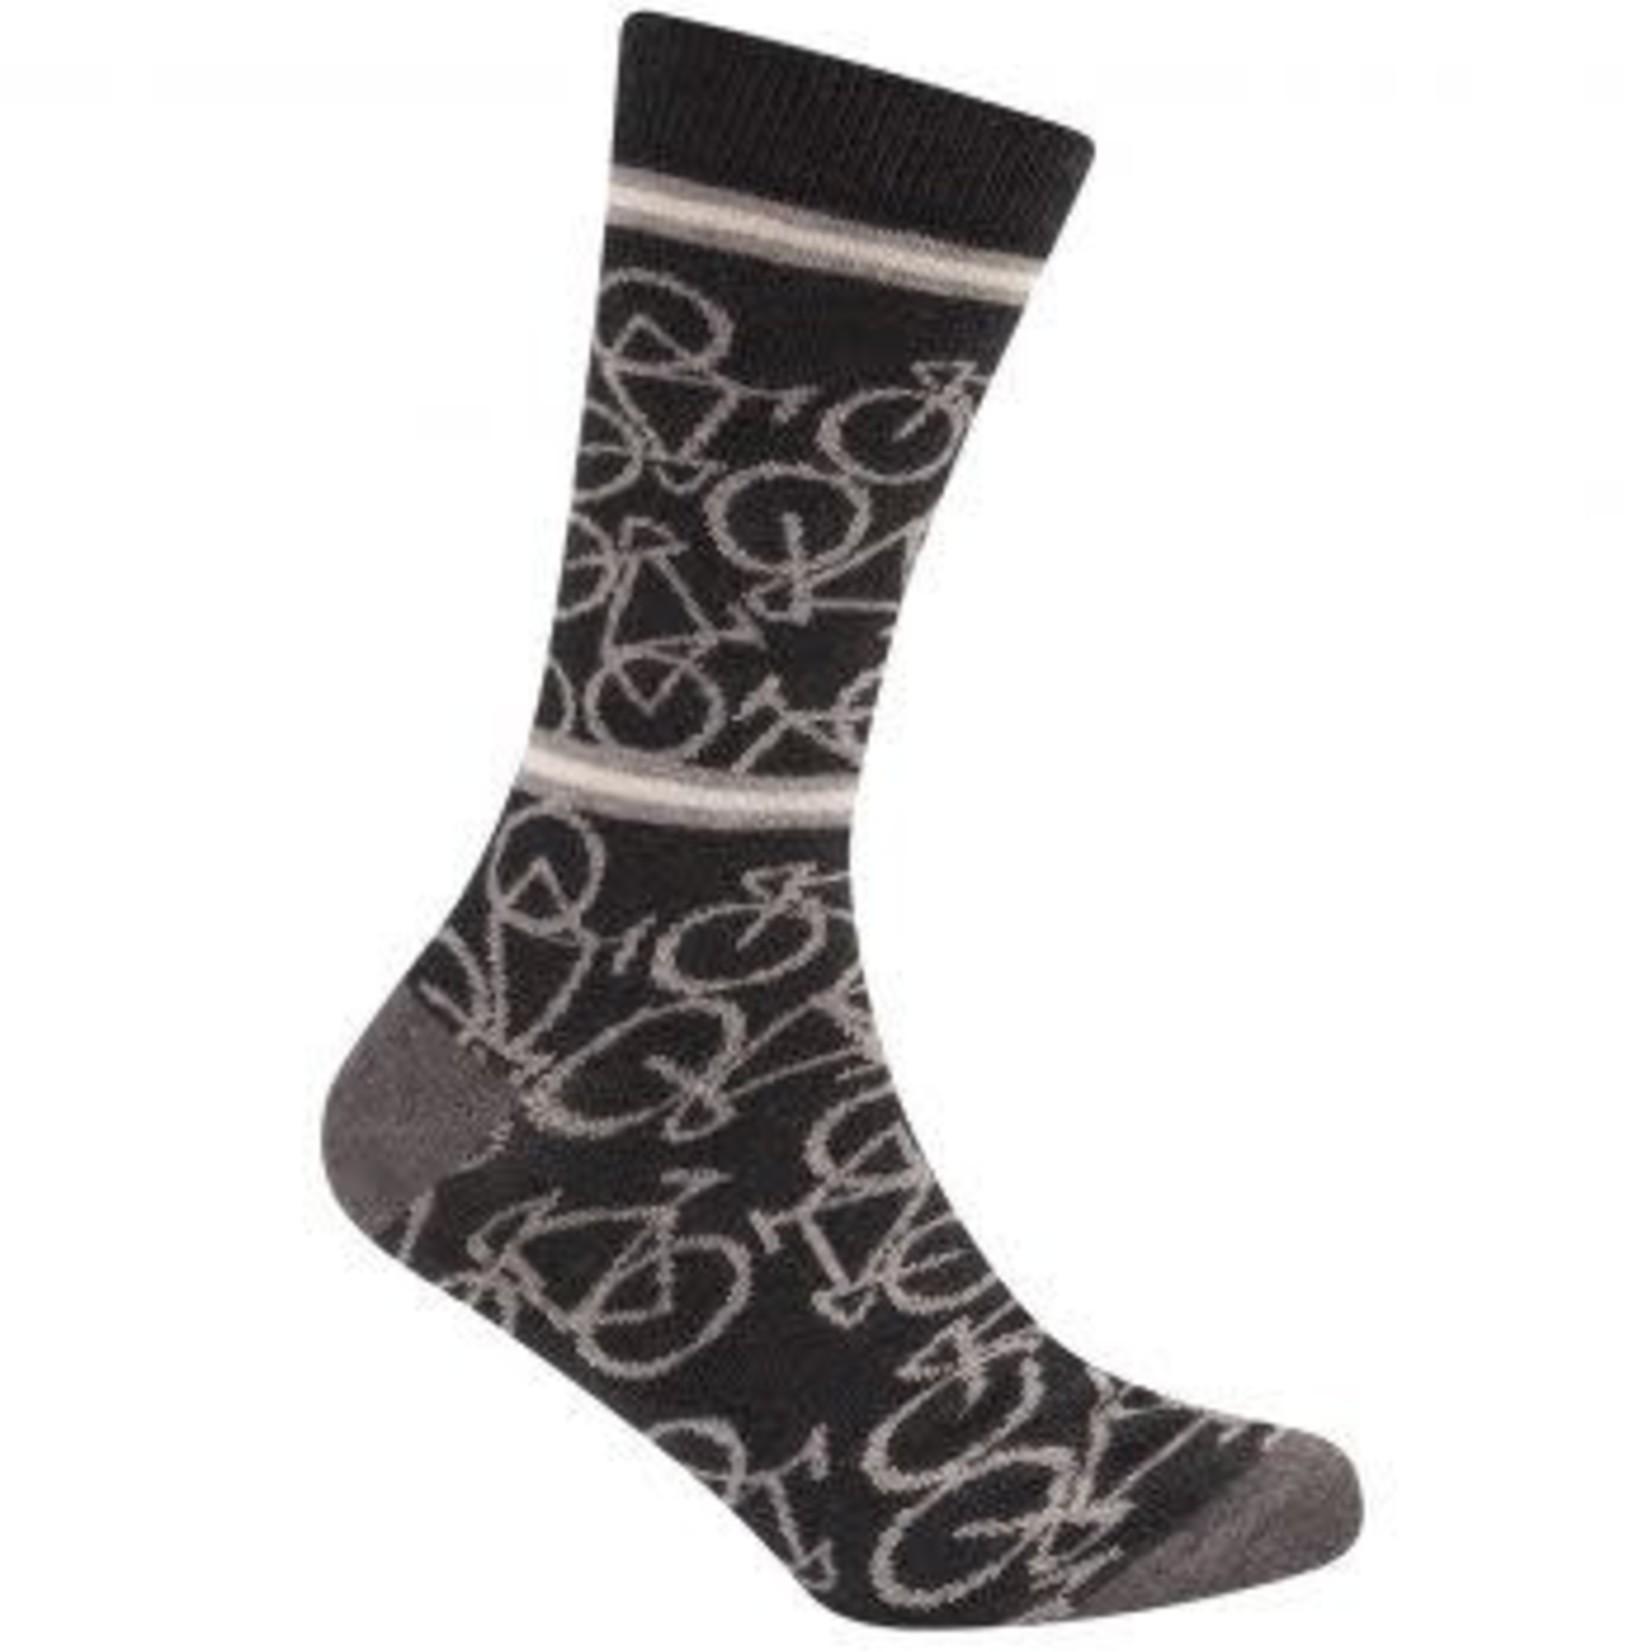 Sokken 'Le Patron' Bicycle socks donkergrijs